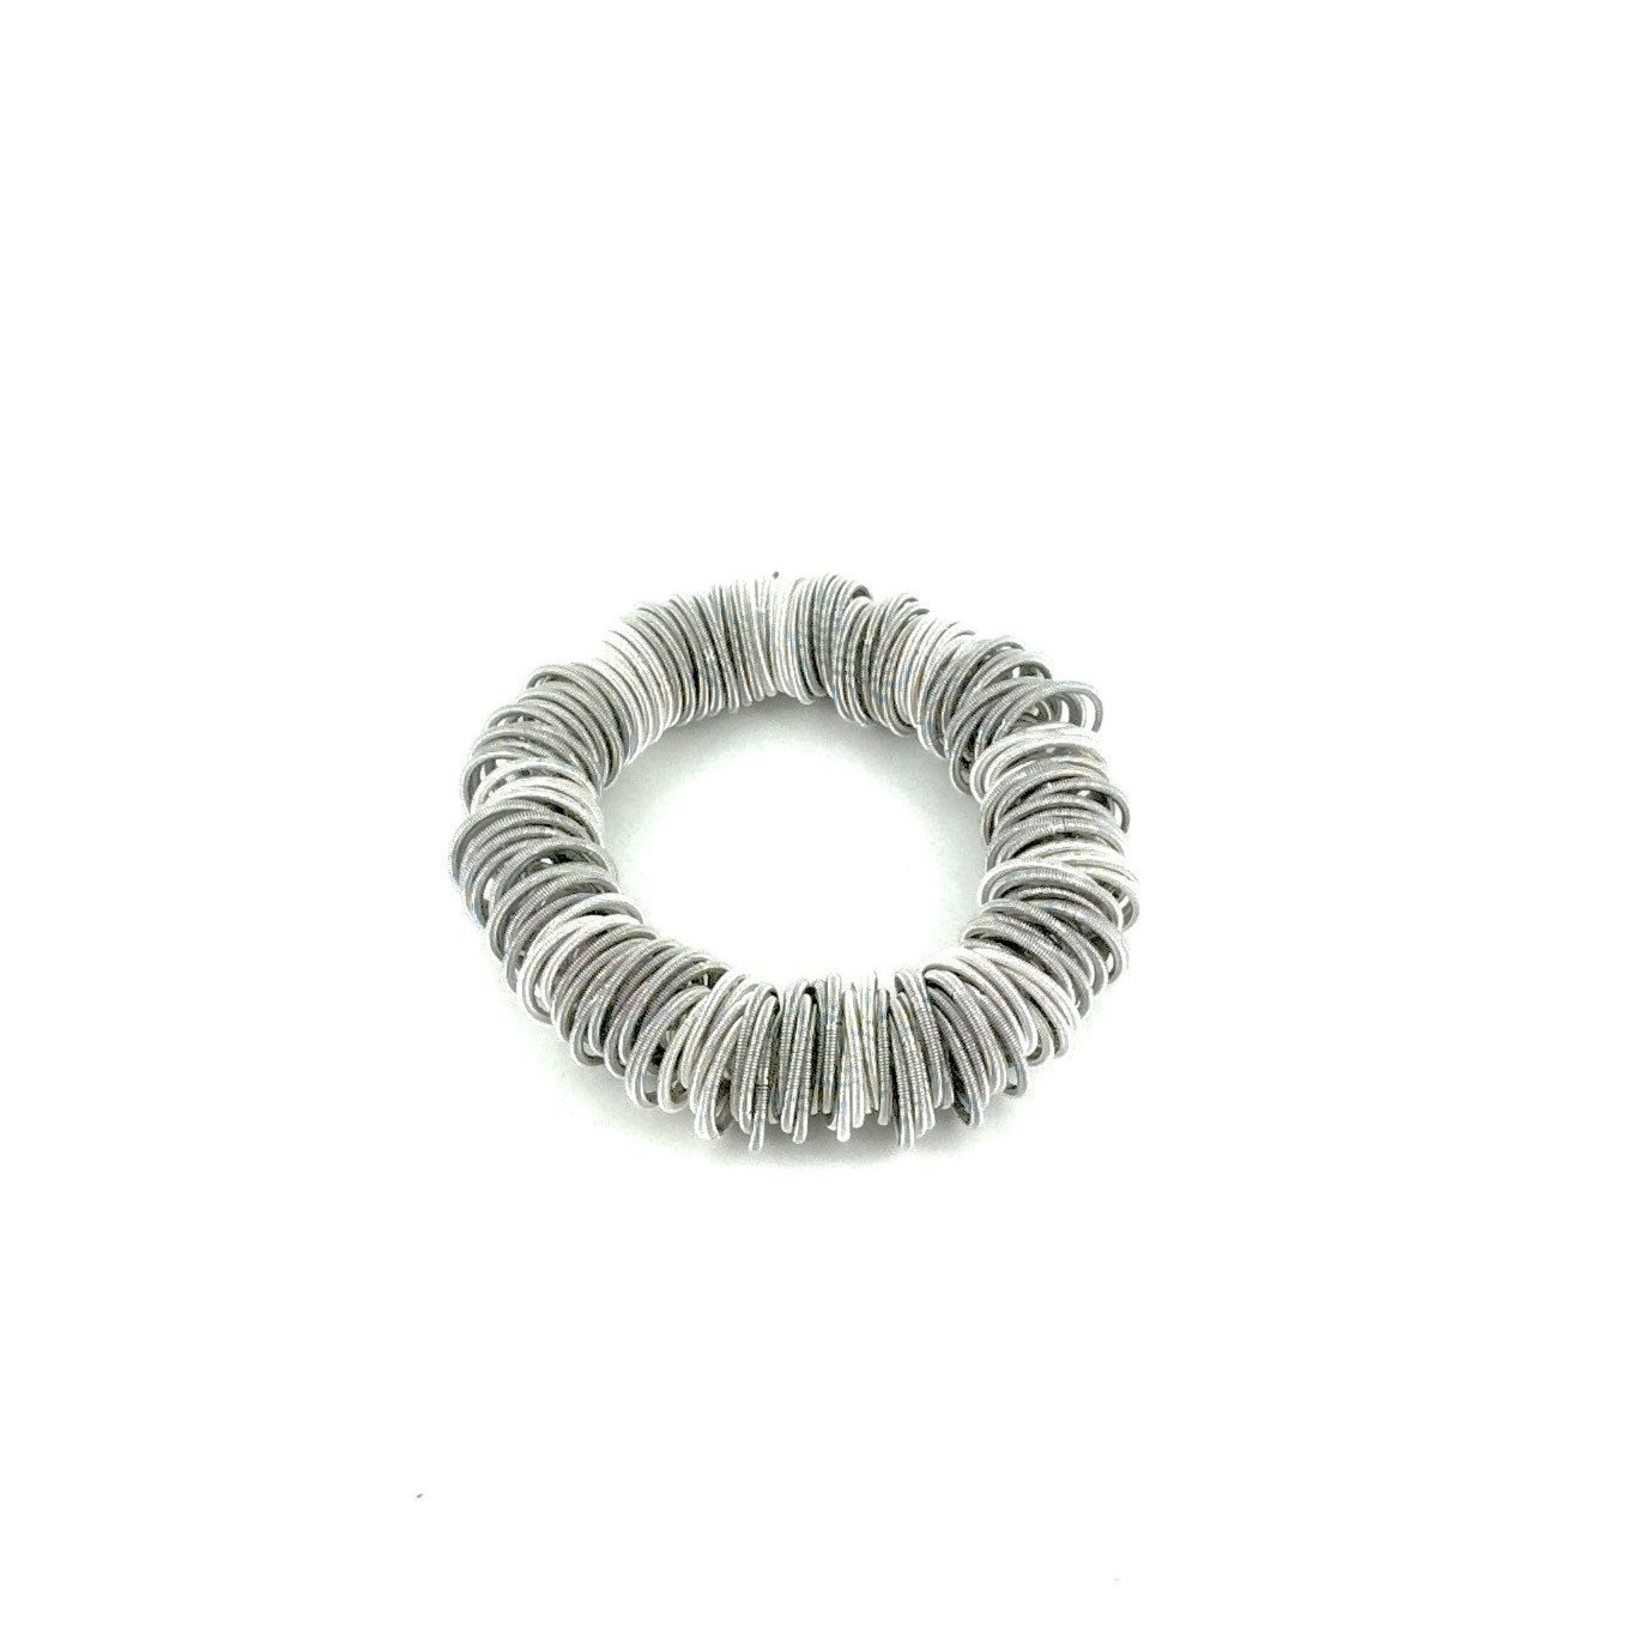 Sea Lily White/Silver PW Spring Ring Bracelet